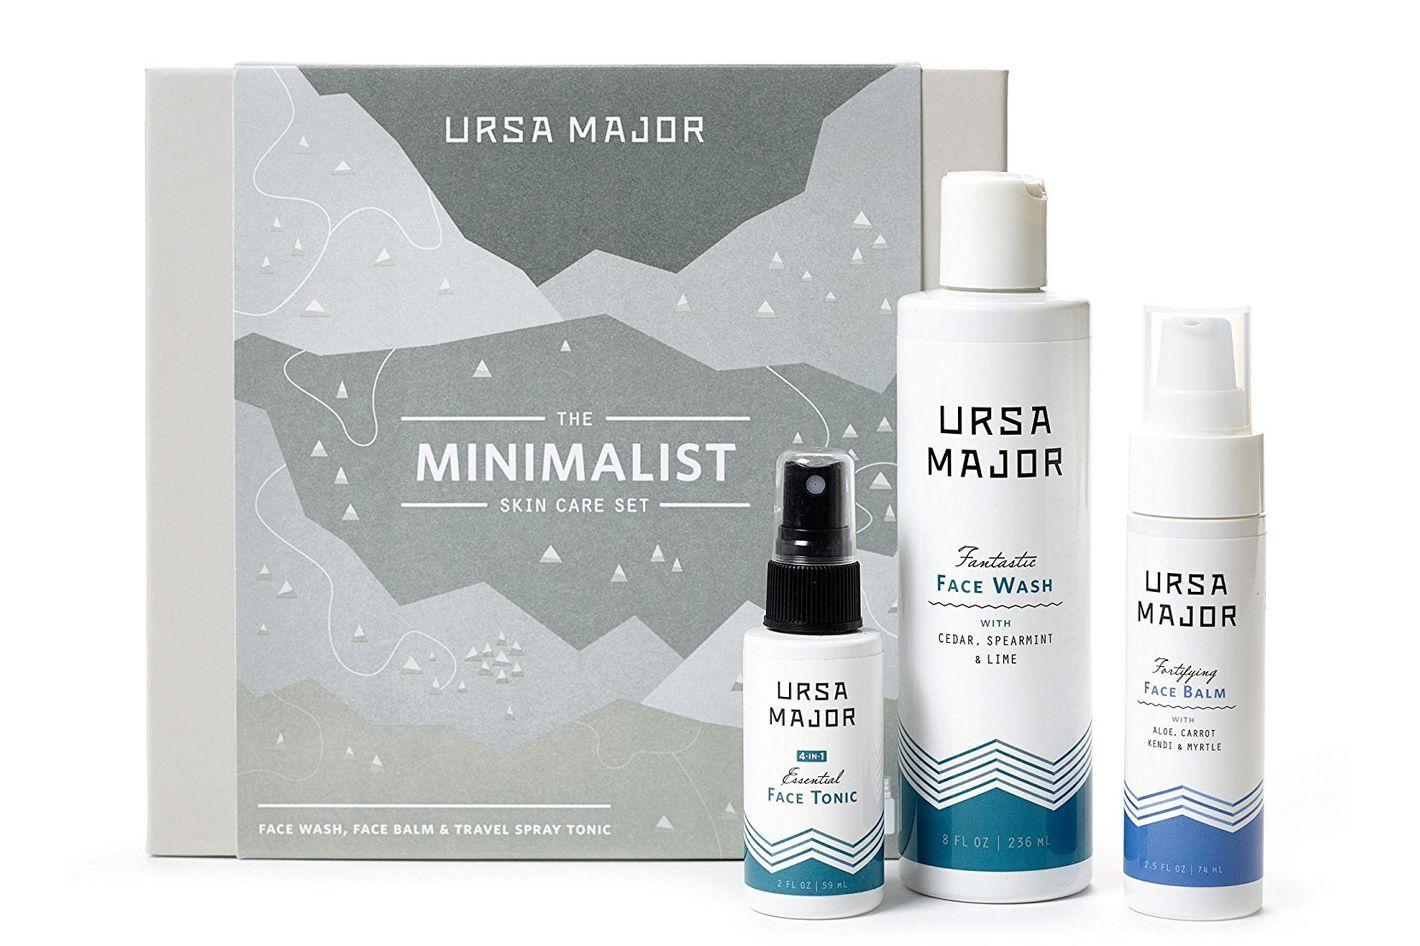 Ursa Major the Minimalist Skin Care Set